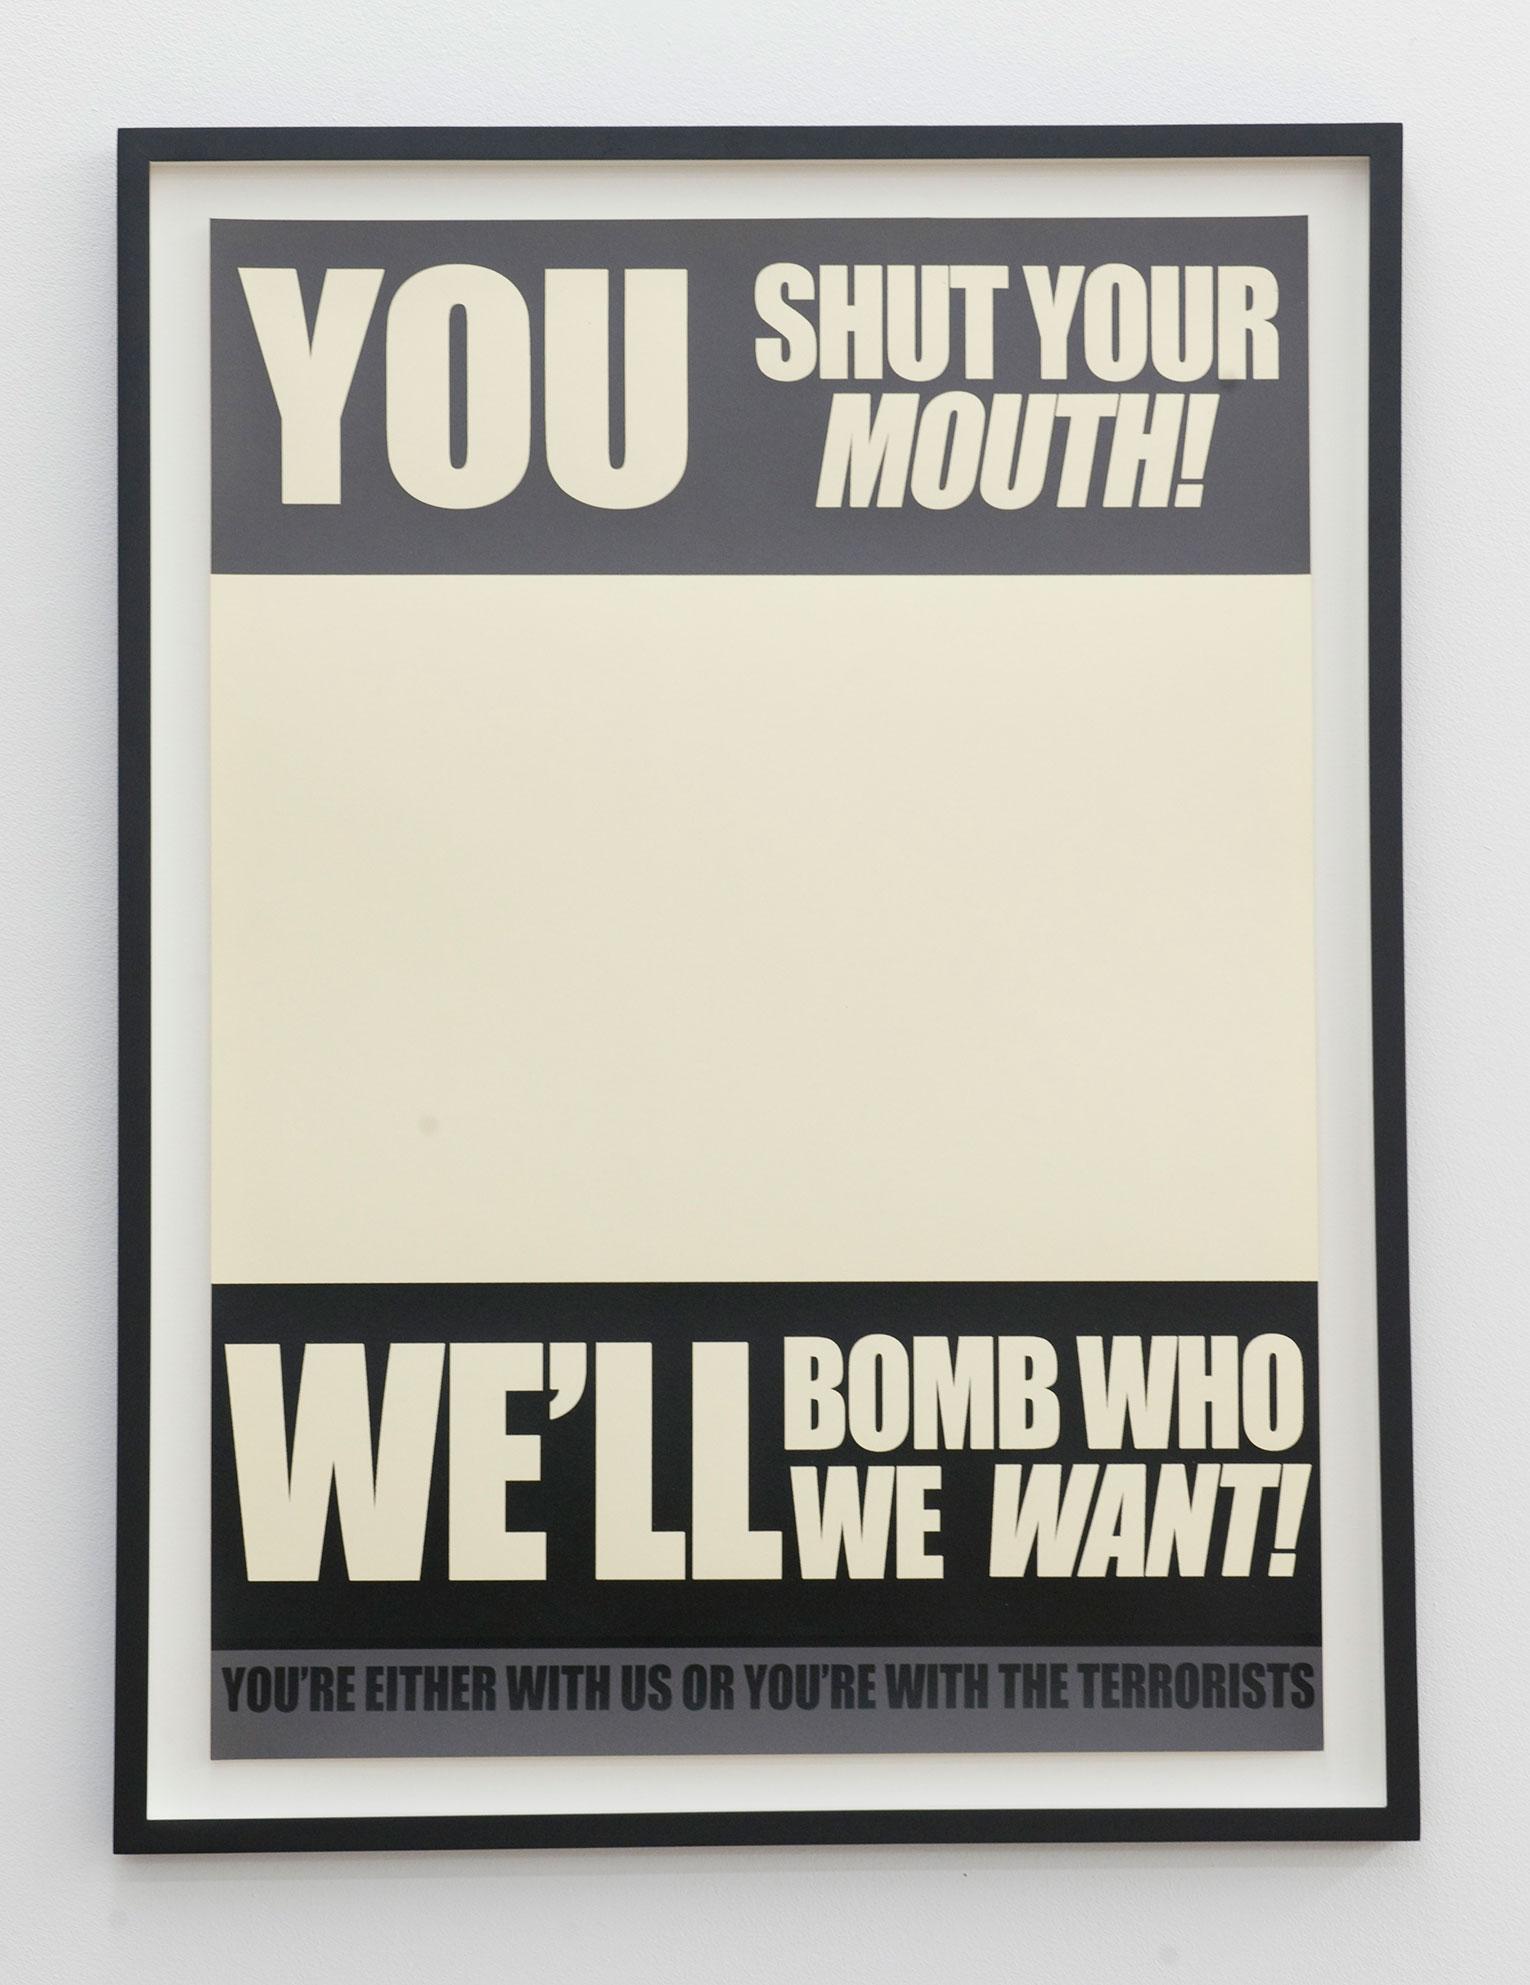 <b>Title:</b>Propaganda War Posters<br /><b>Year:</b>2010<br /><b>Medium:</b>Silkscreen print, framed<br /><b>Size:</b>50 x 70 cm